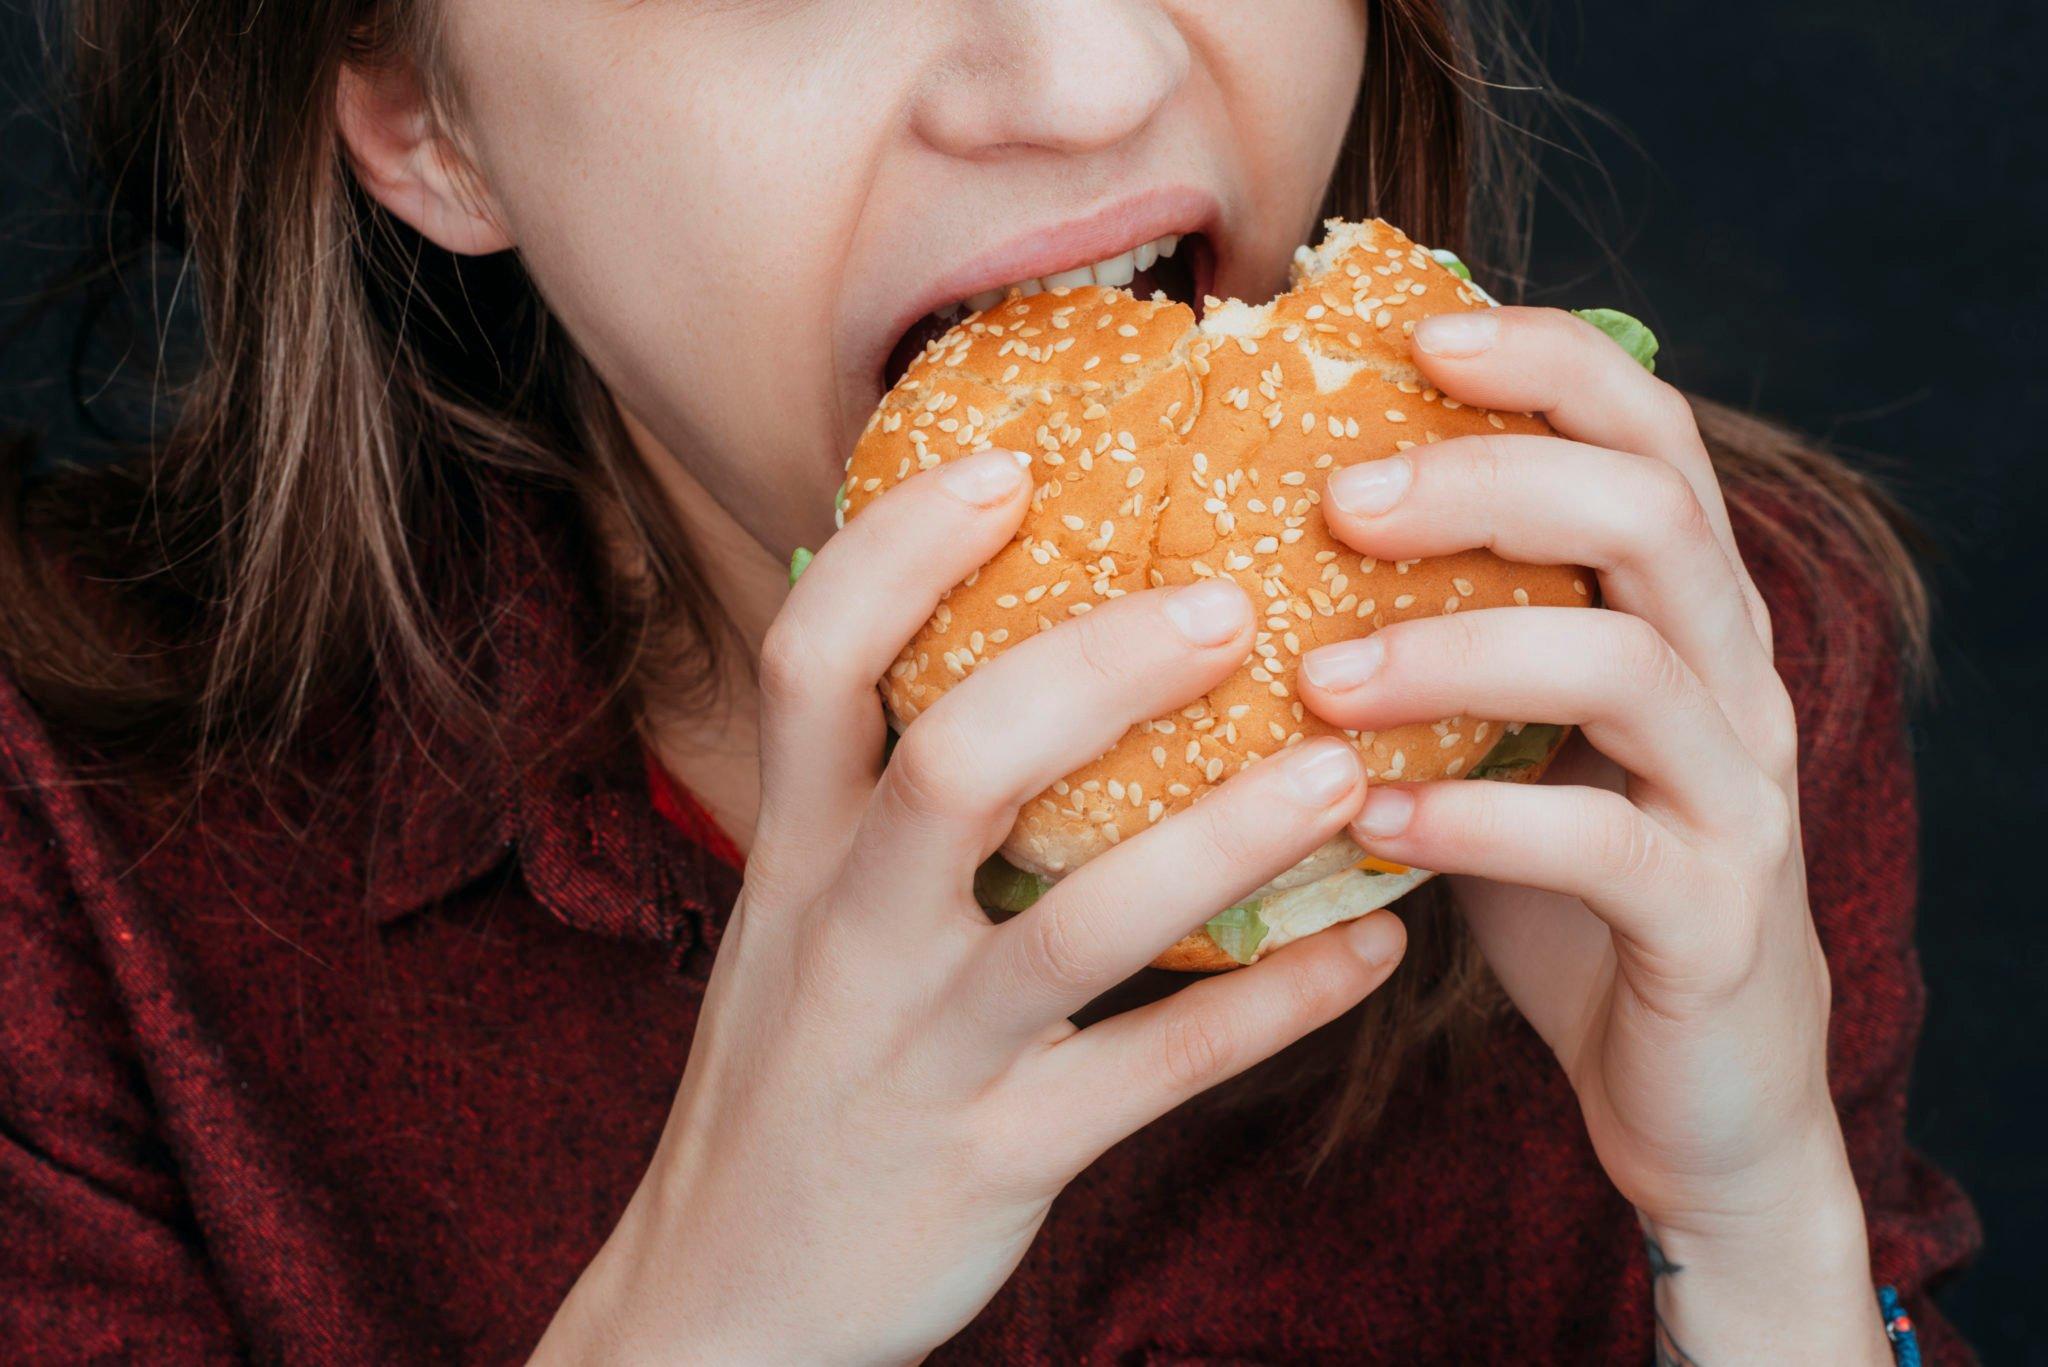 cropped view of girl biting tasty hamburger